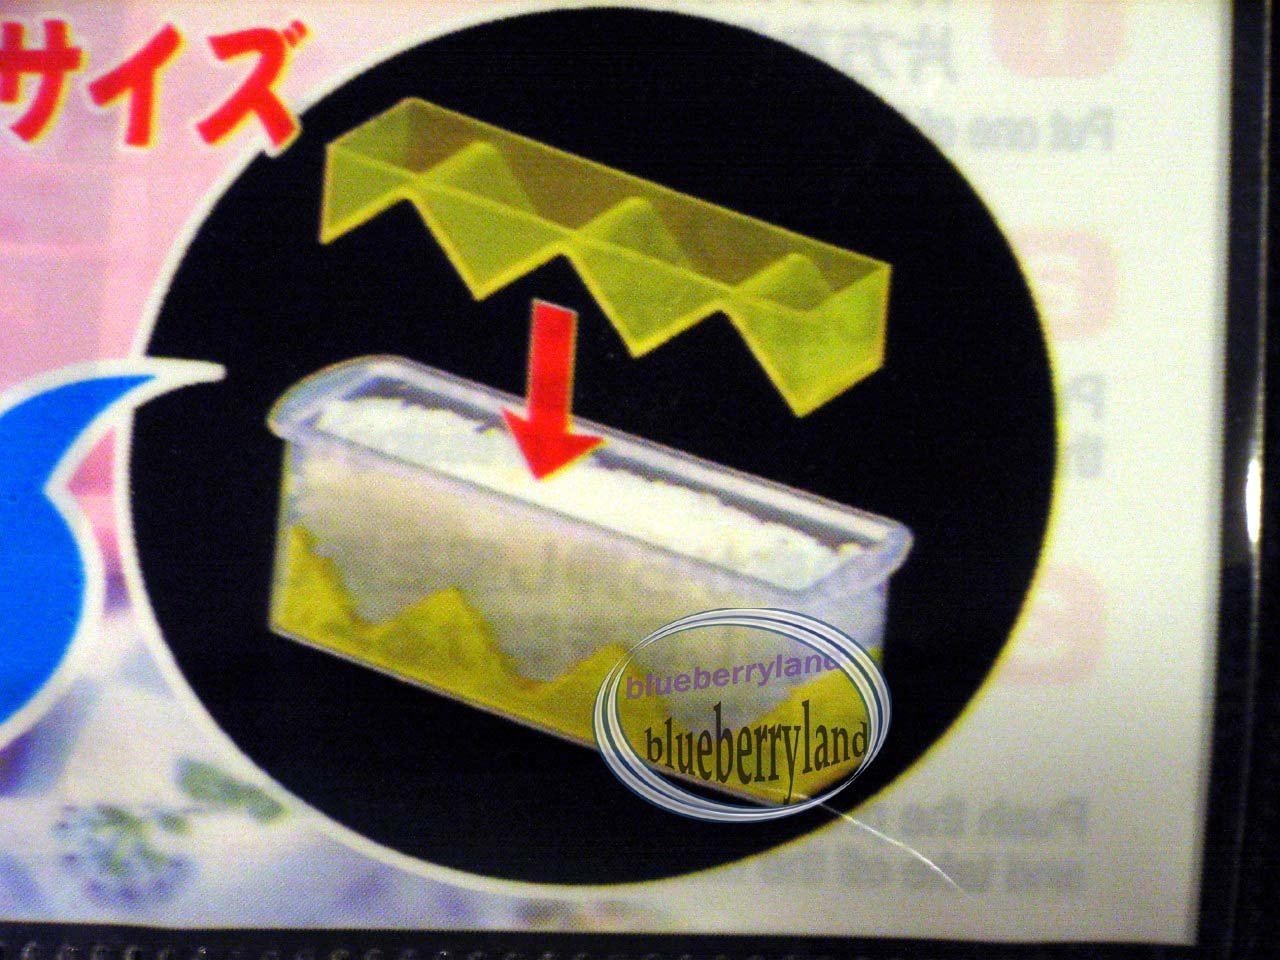 Japan Bento SUSHI Mould dice square Rice Ball Onigiri Mold Maker